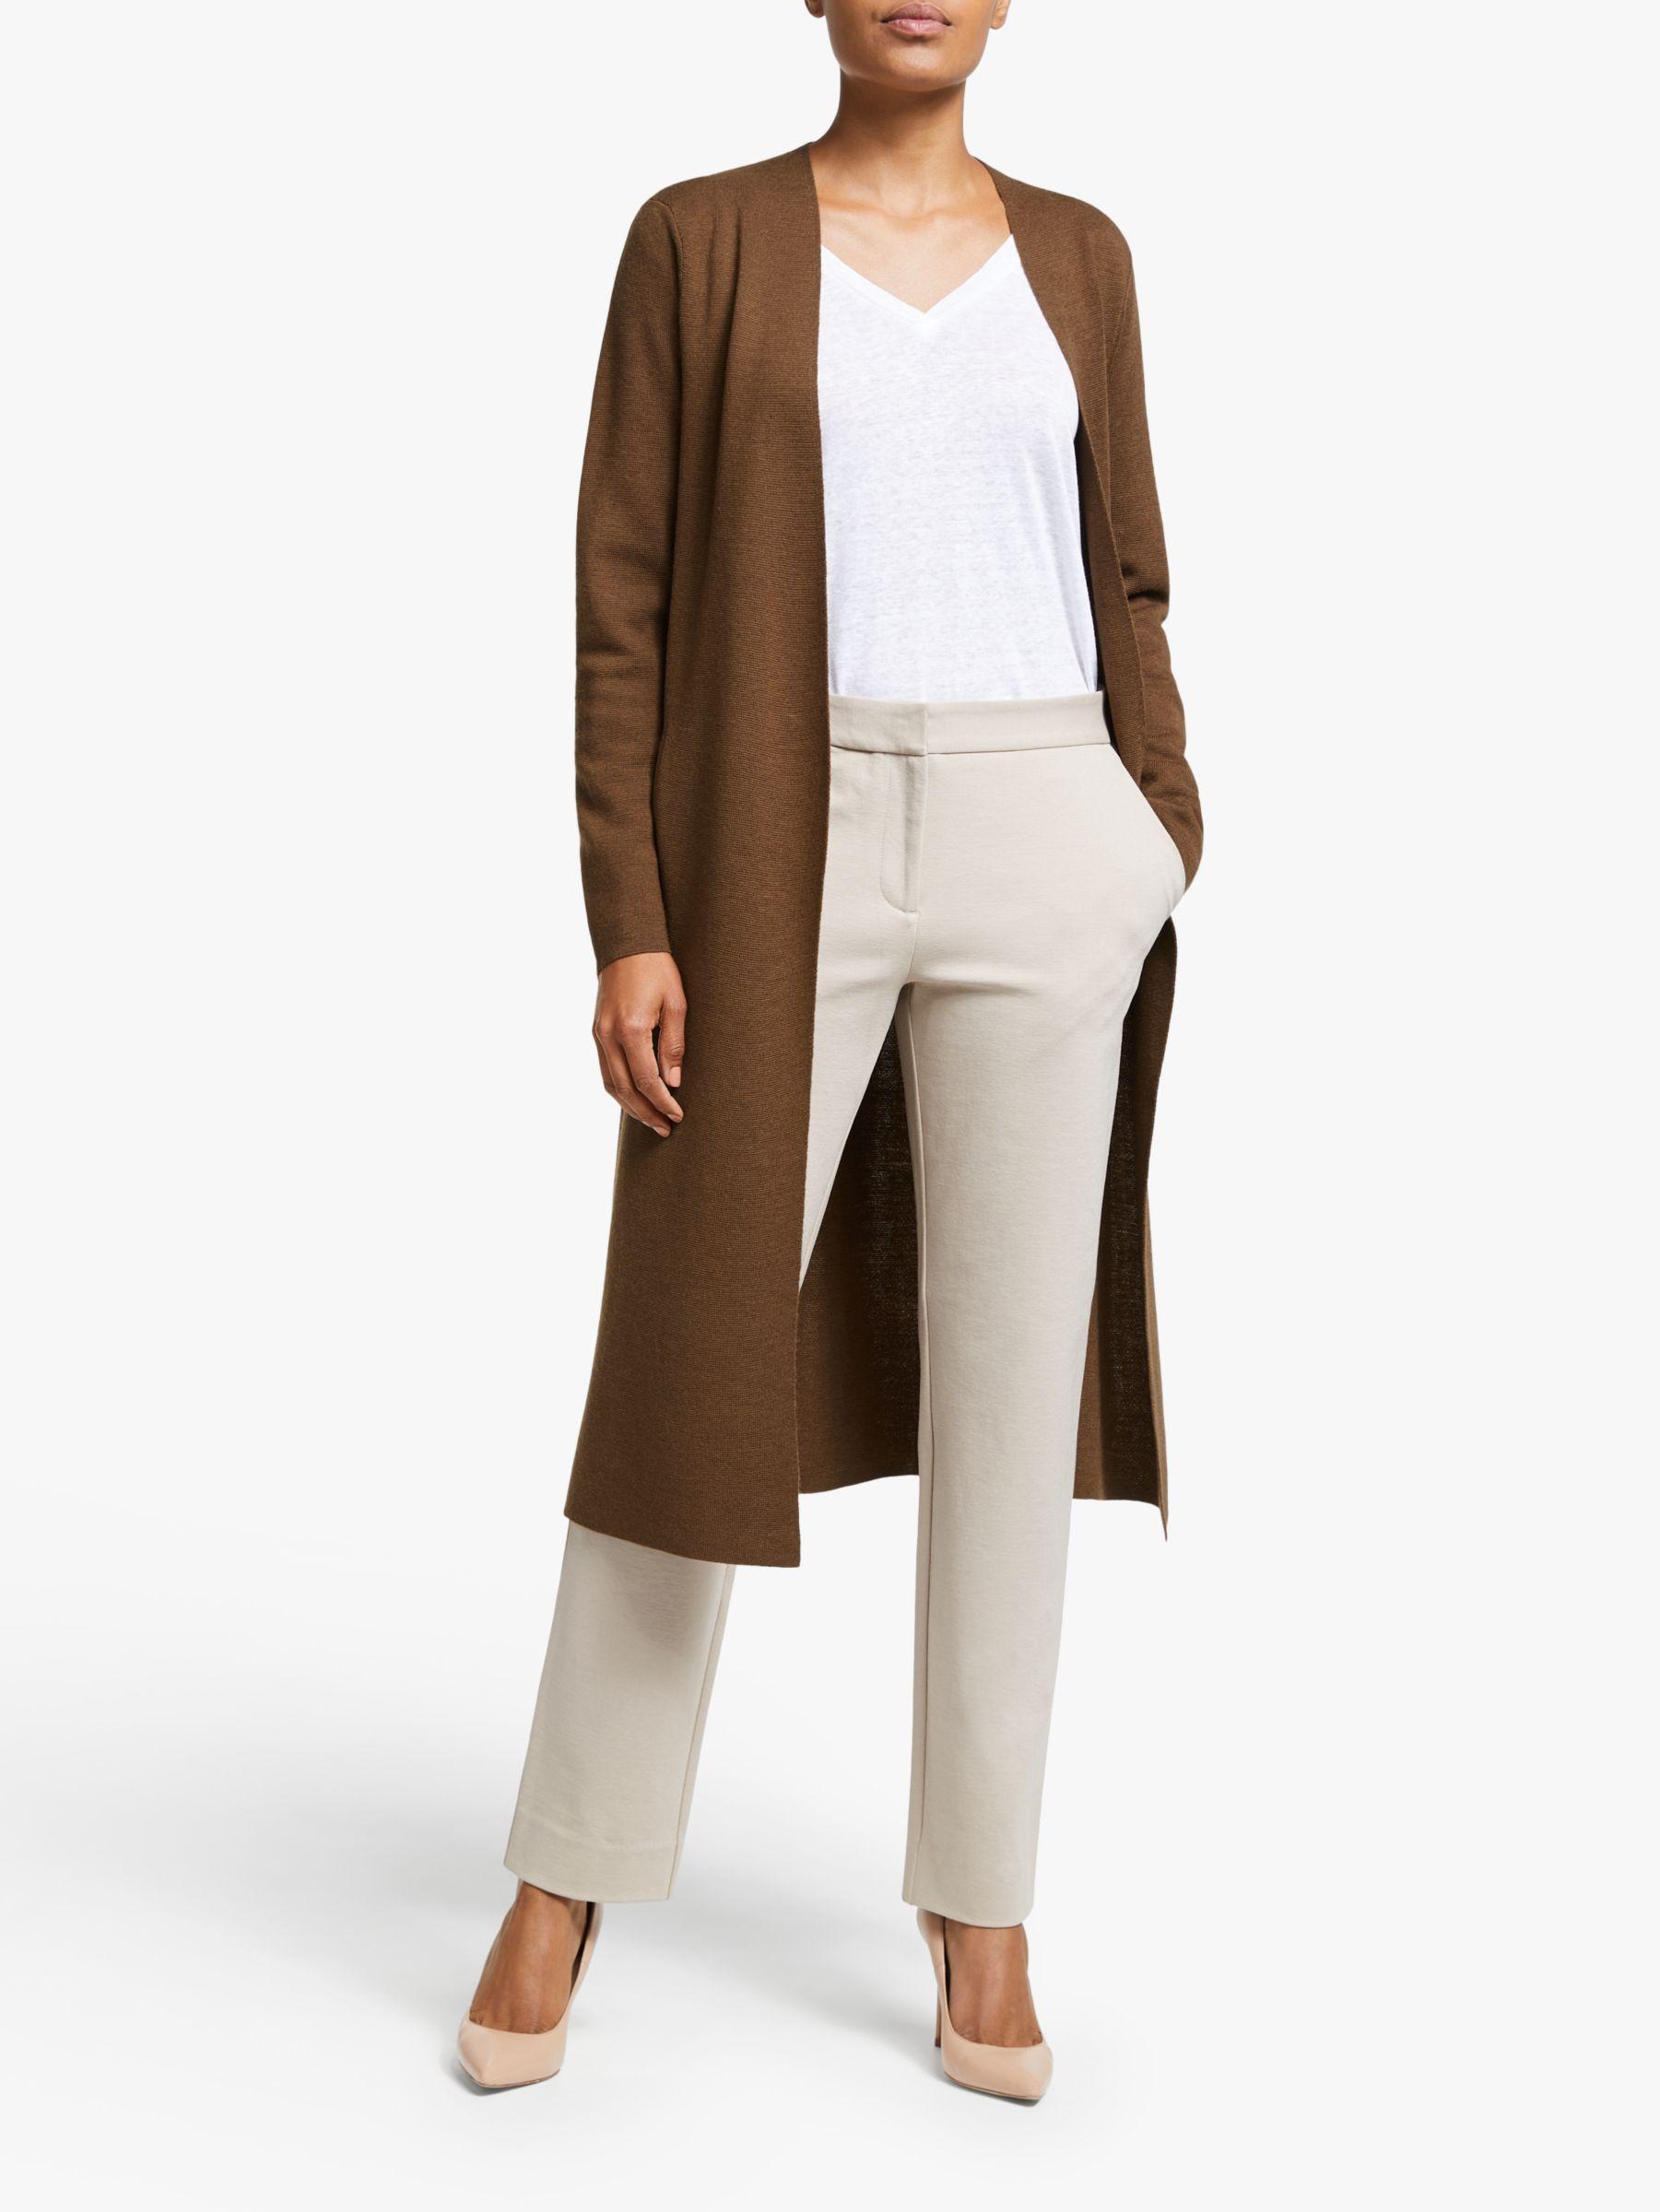 Winser London Winser London Milano Merino Wool Coat